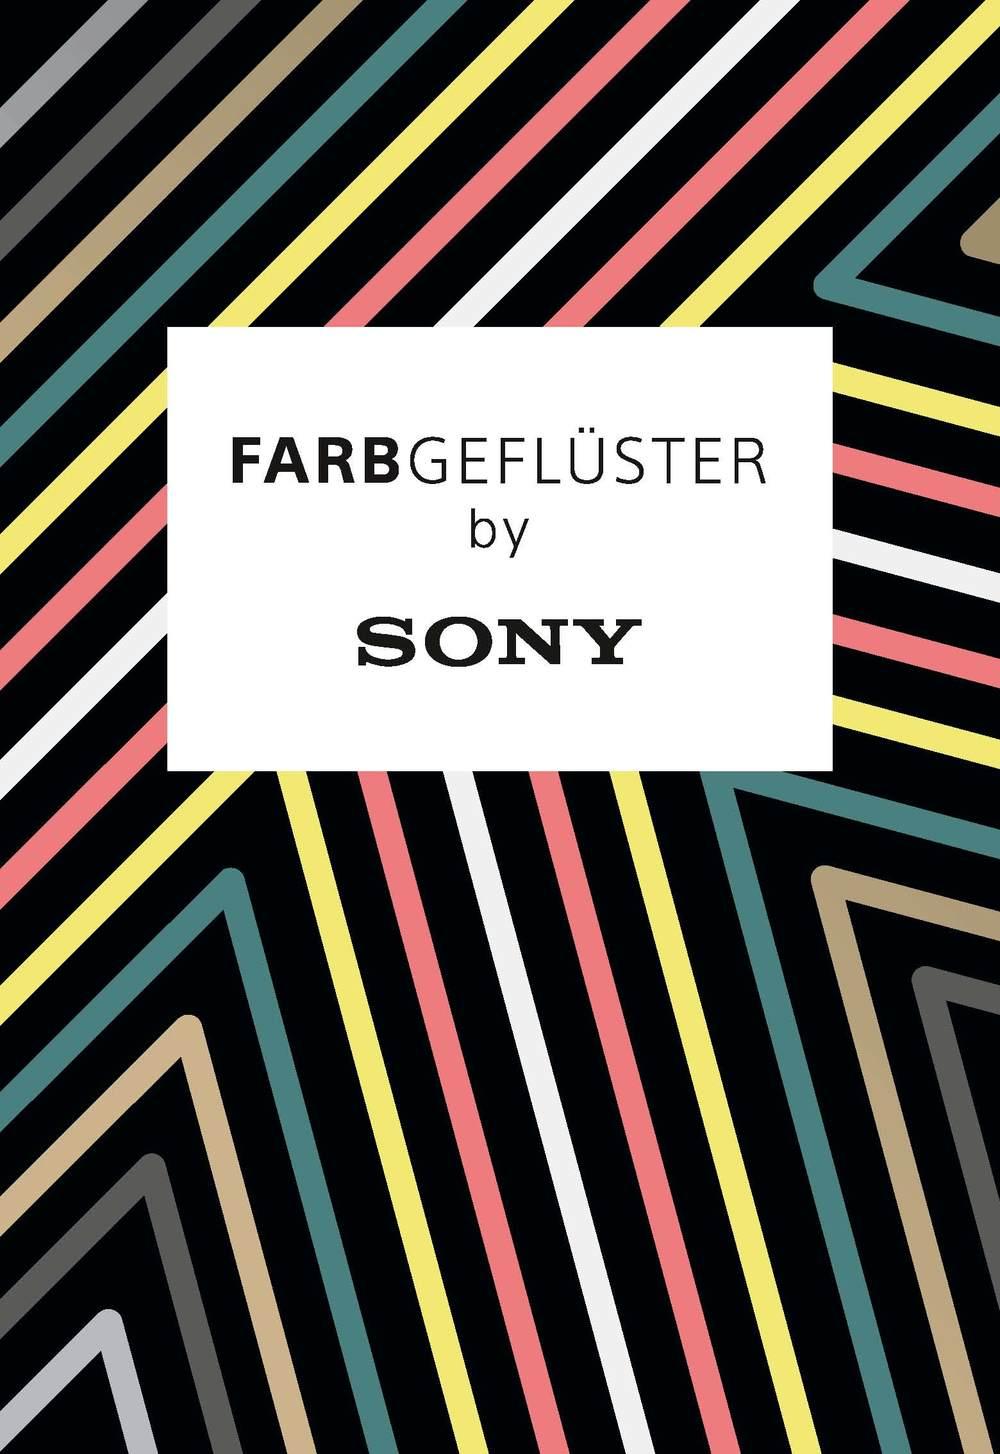 Sony Mobile - Lookbook FARBGEFLÜSTER by Sony_Seite_01.jpg